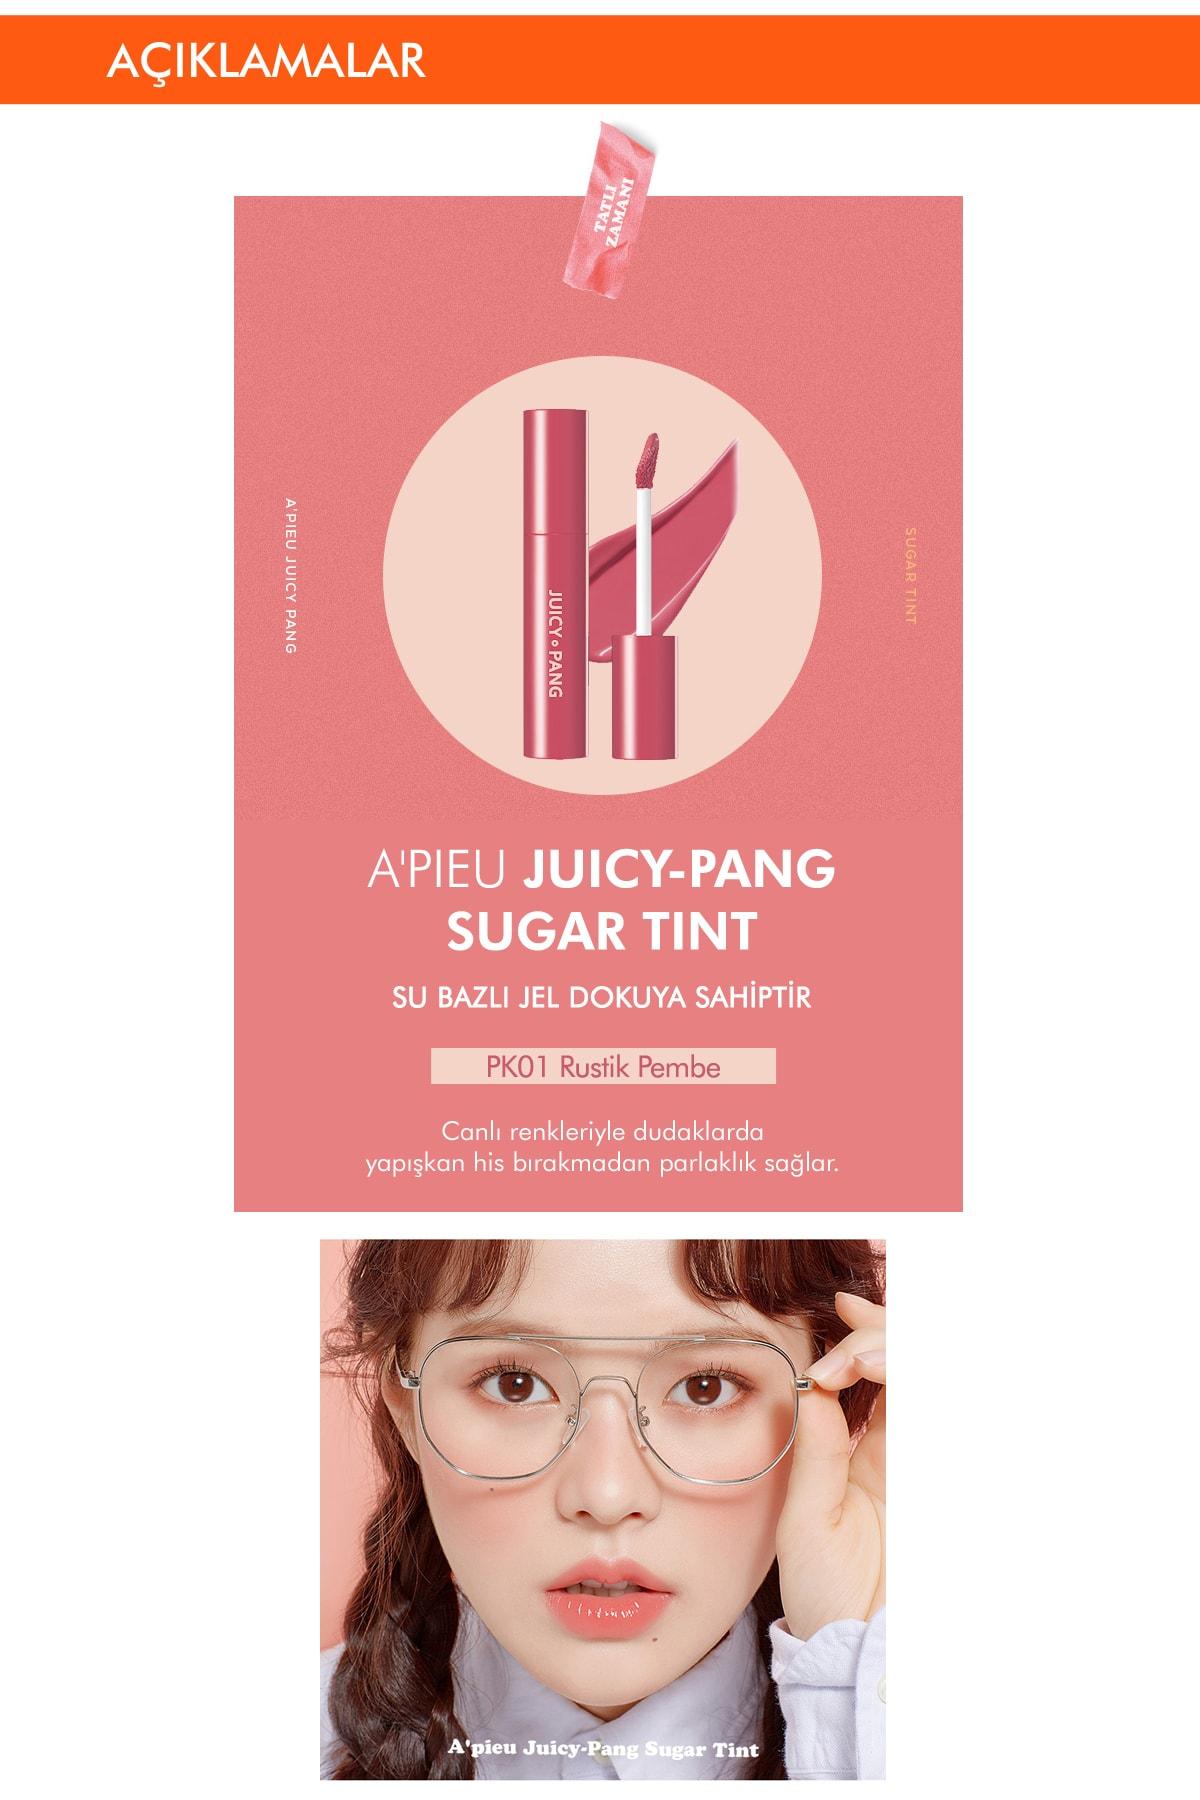 Missha Uzun Süre Kalıcı Parlak Su Bazlı Jel Tint APIEU Juicy-Pang Sugar Tint (PK01) 2